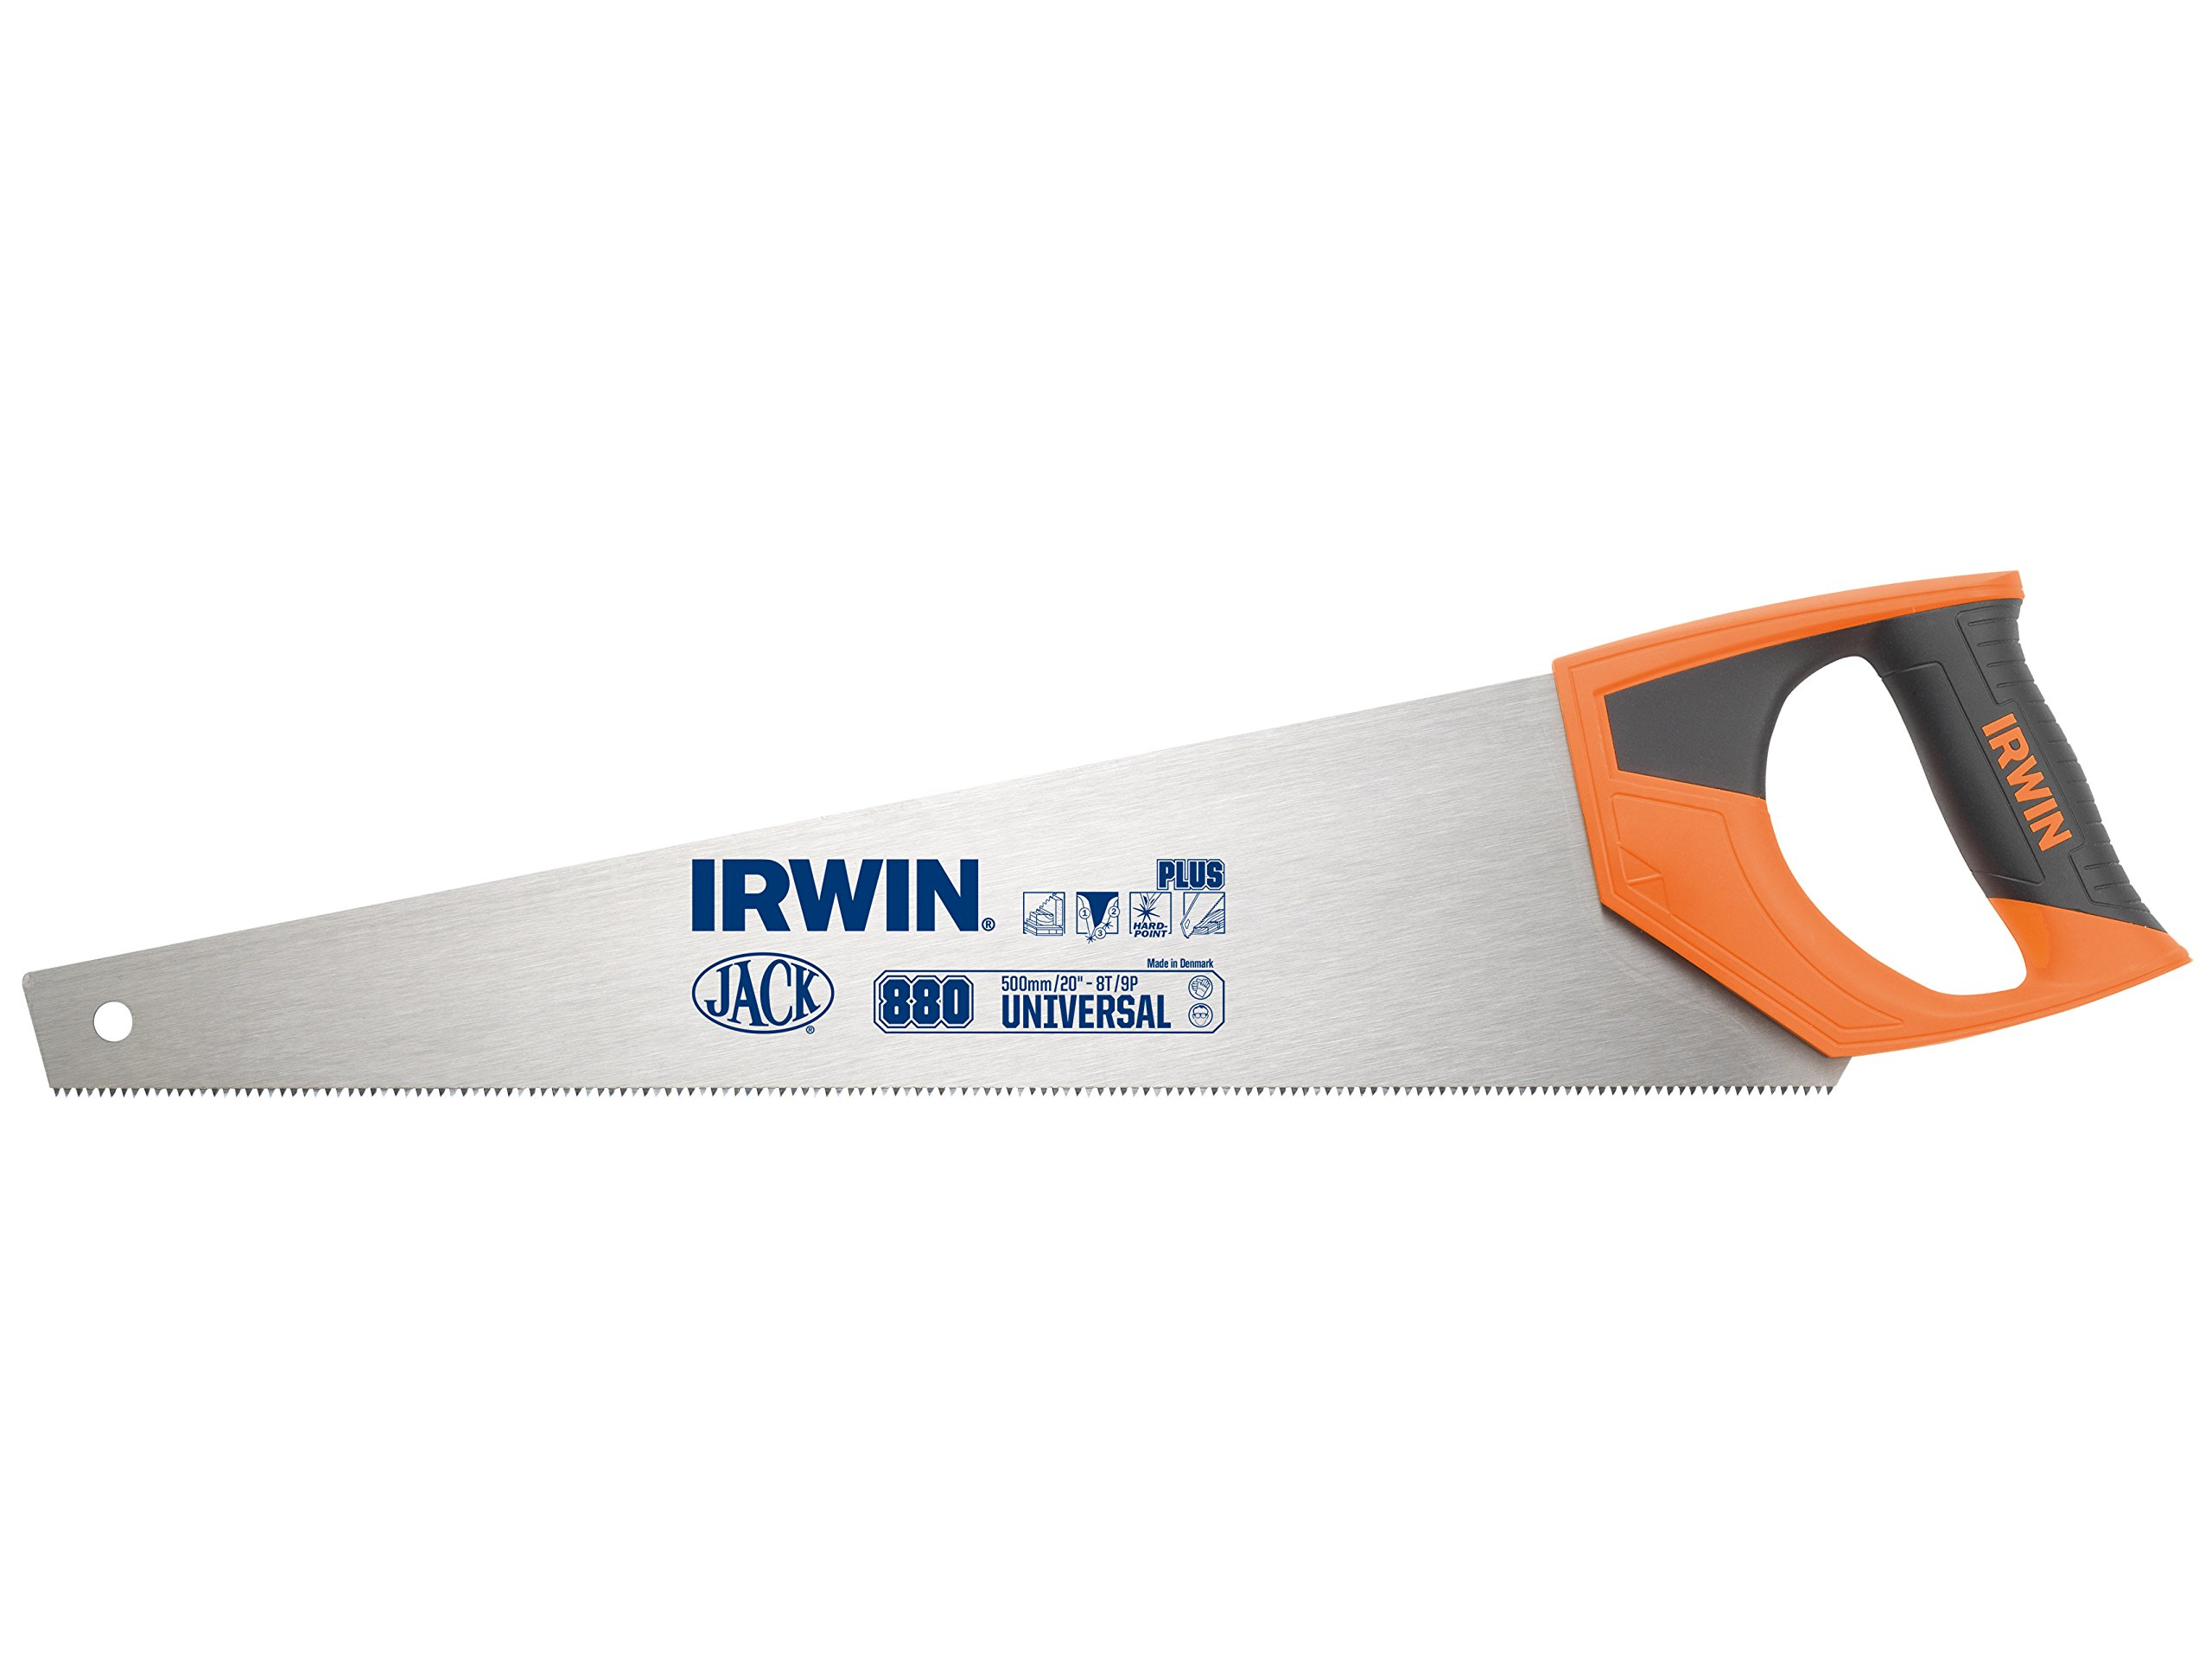 Irwin Jack 880 Un Universal Panel Saw 20in 8 Teeth / 9 Point